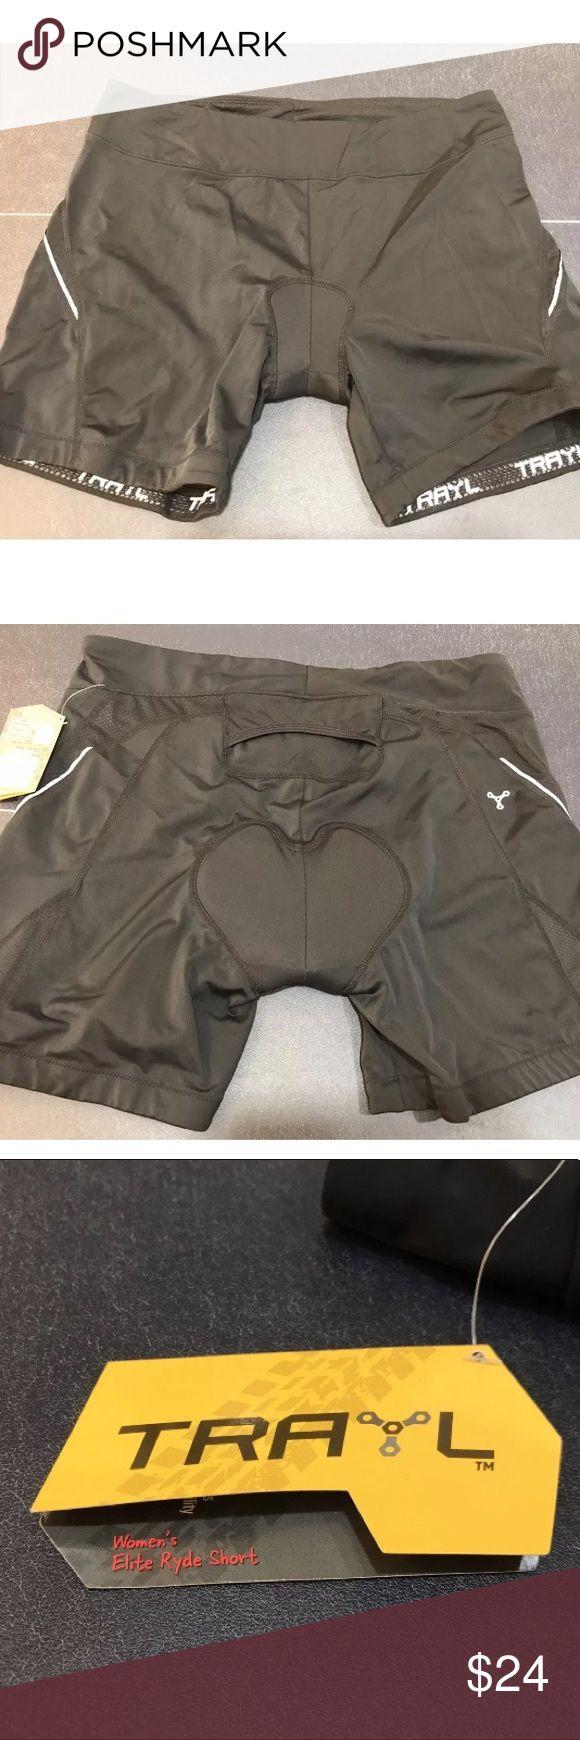 TRAYL Women's Black Padded Cycling Shorts Sz XL New with tags. Trayl Shorts